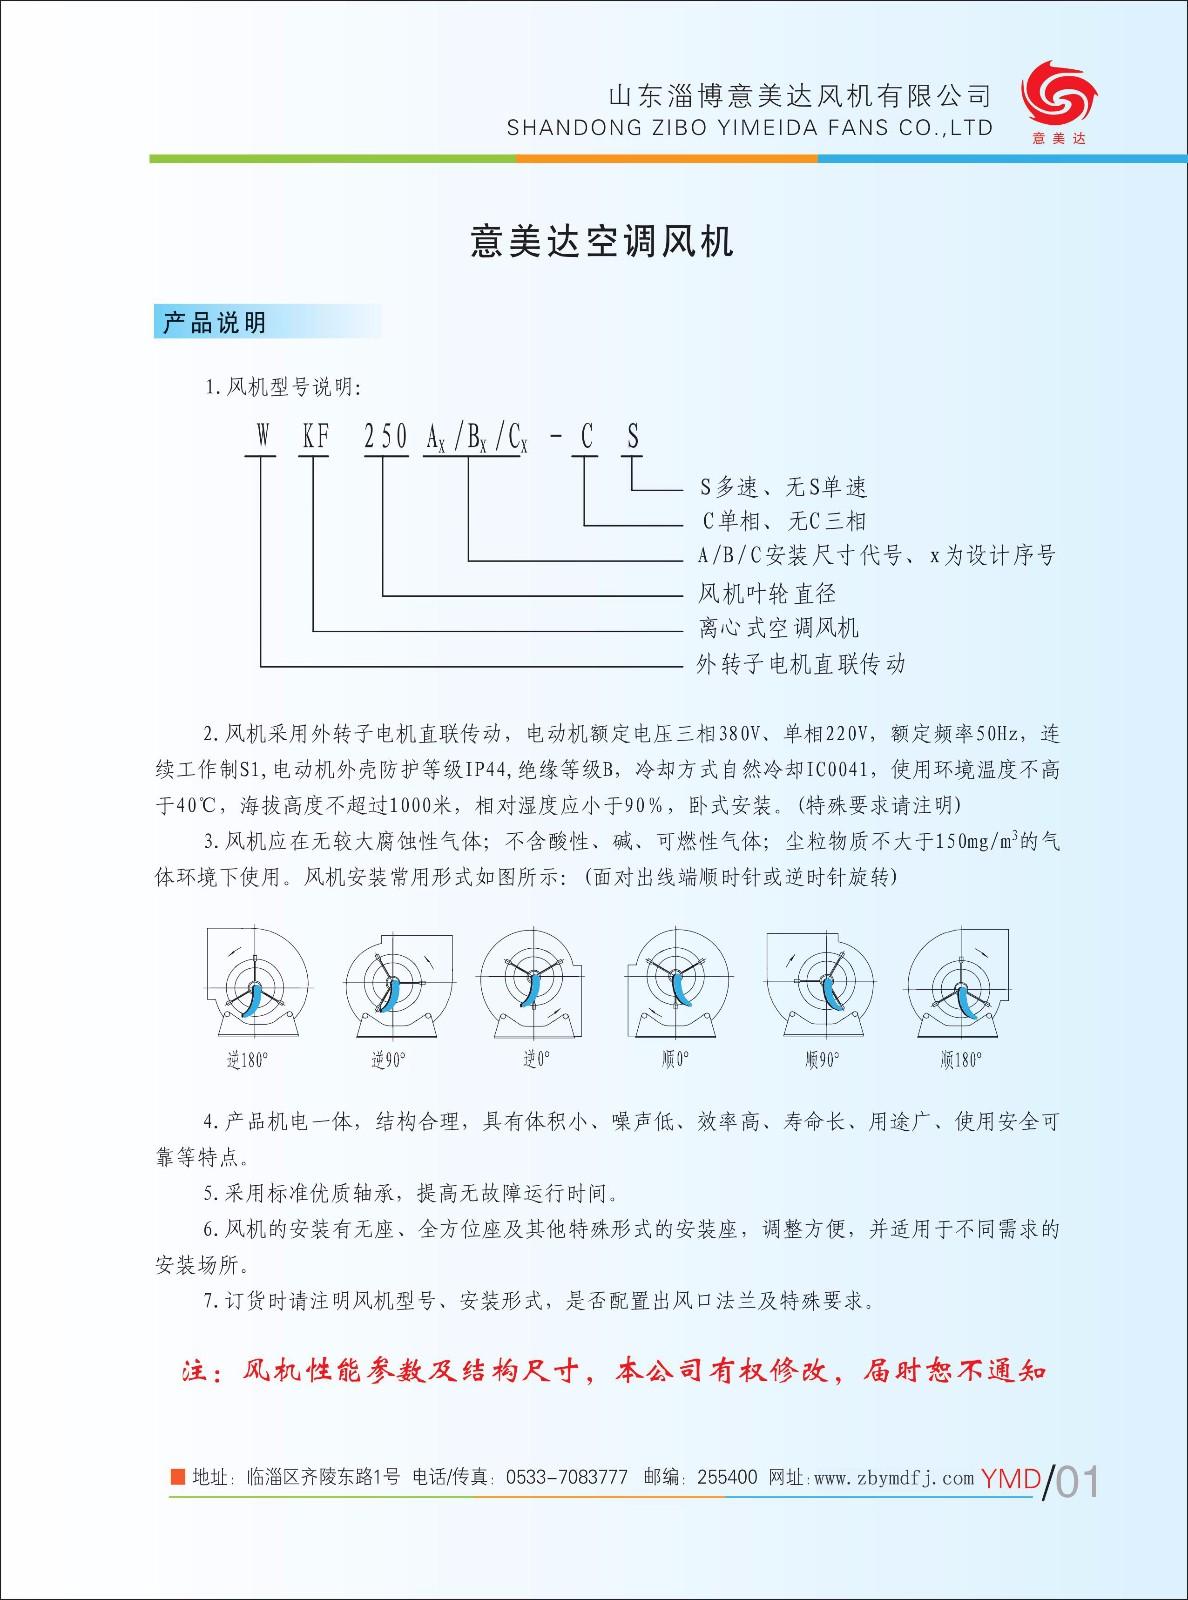 WKF200A1|WKF200A-山东淄博意美达风机有限公司